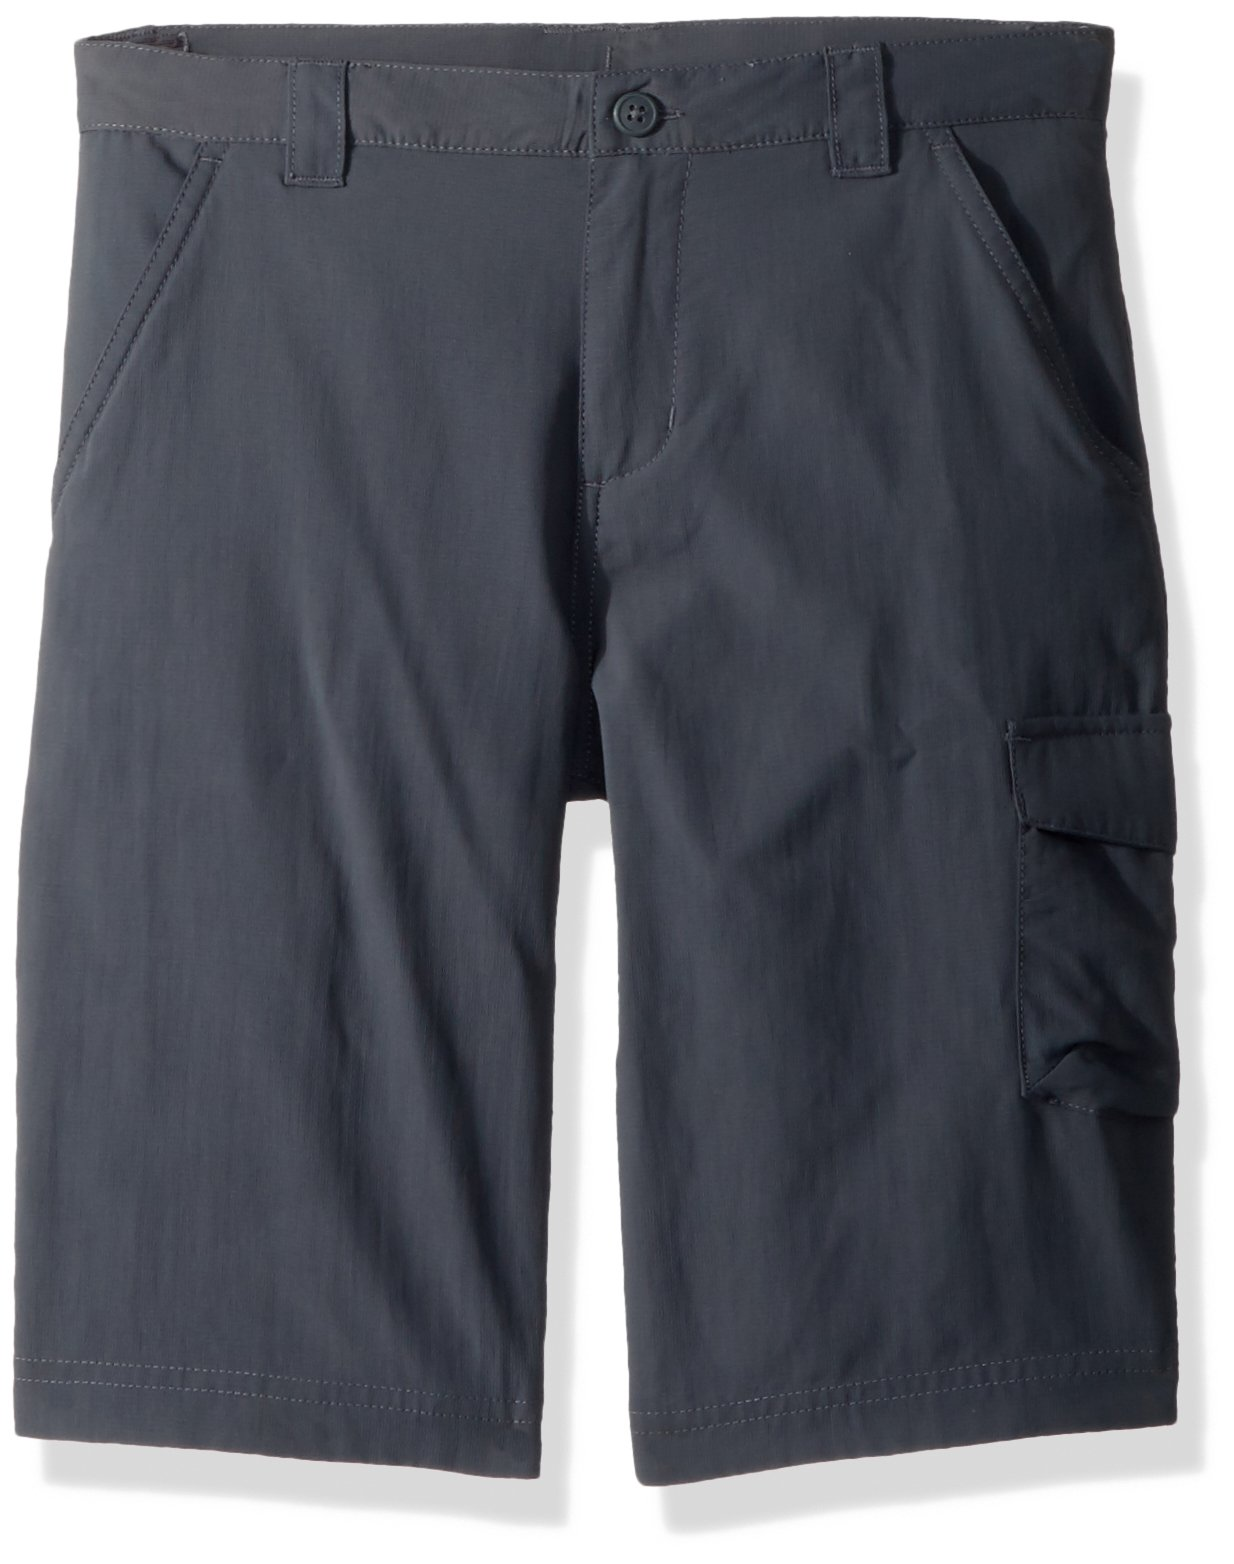 Columbia Youth Boys' Silver Ridge III Short, Breathable, UPF 30 Sun Protection